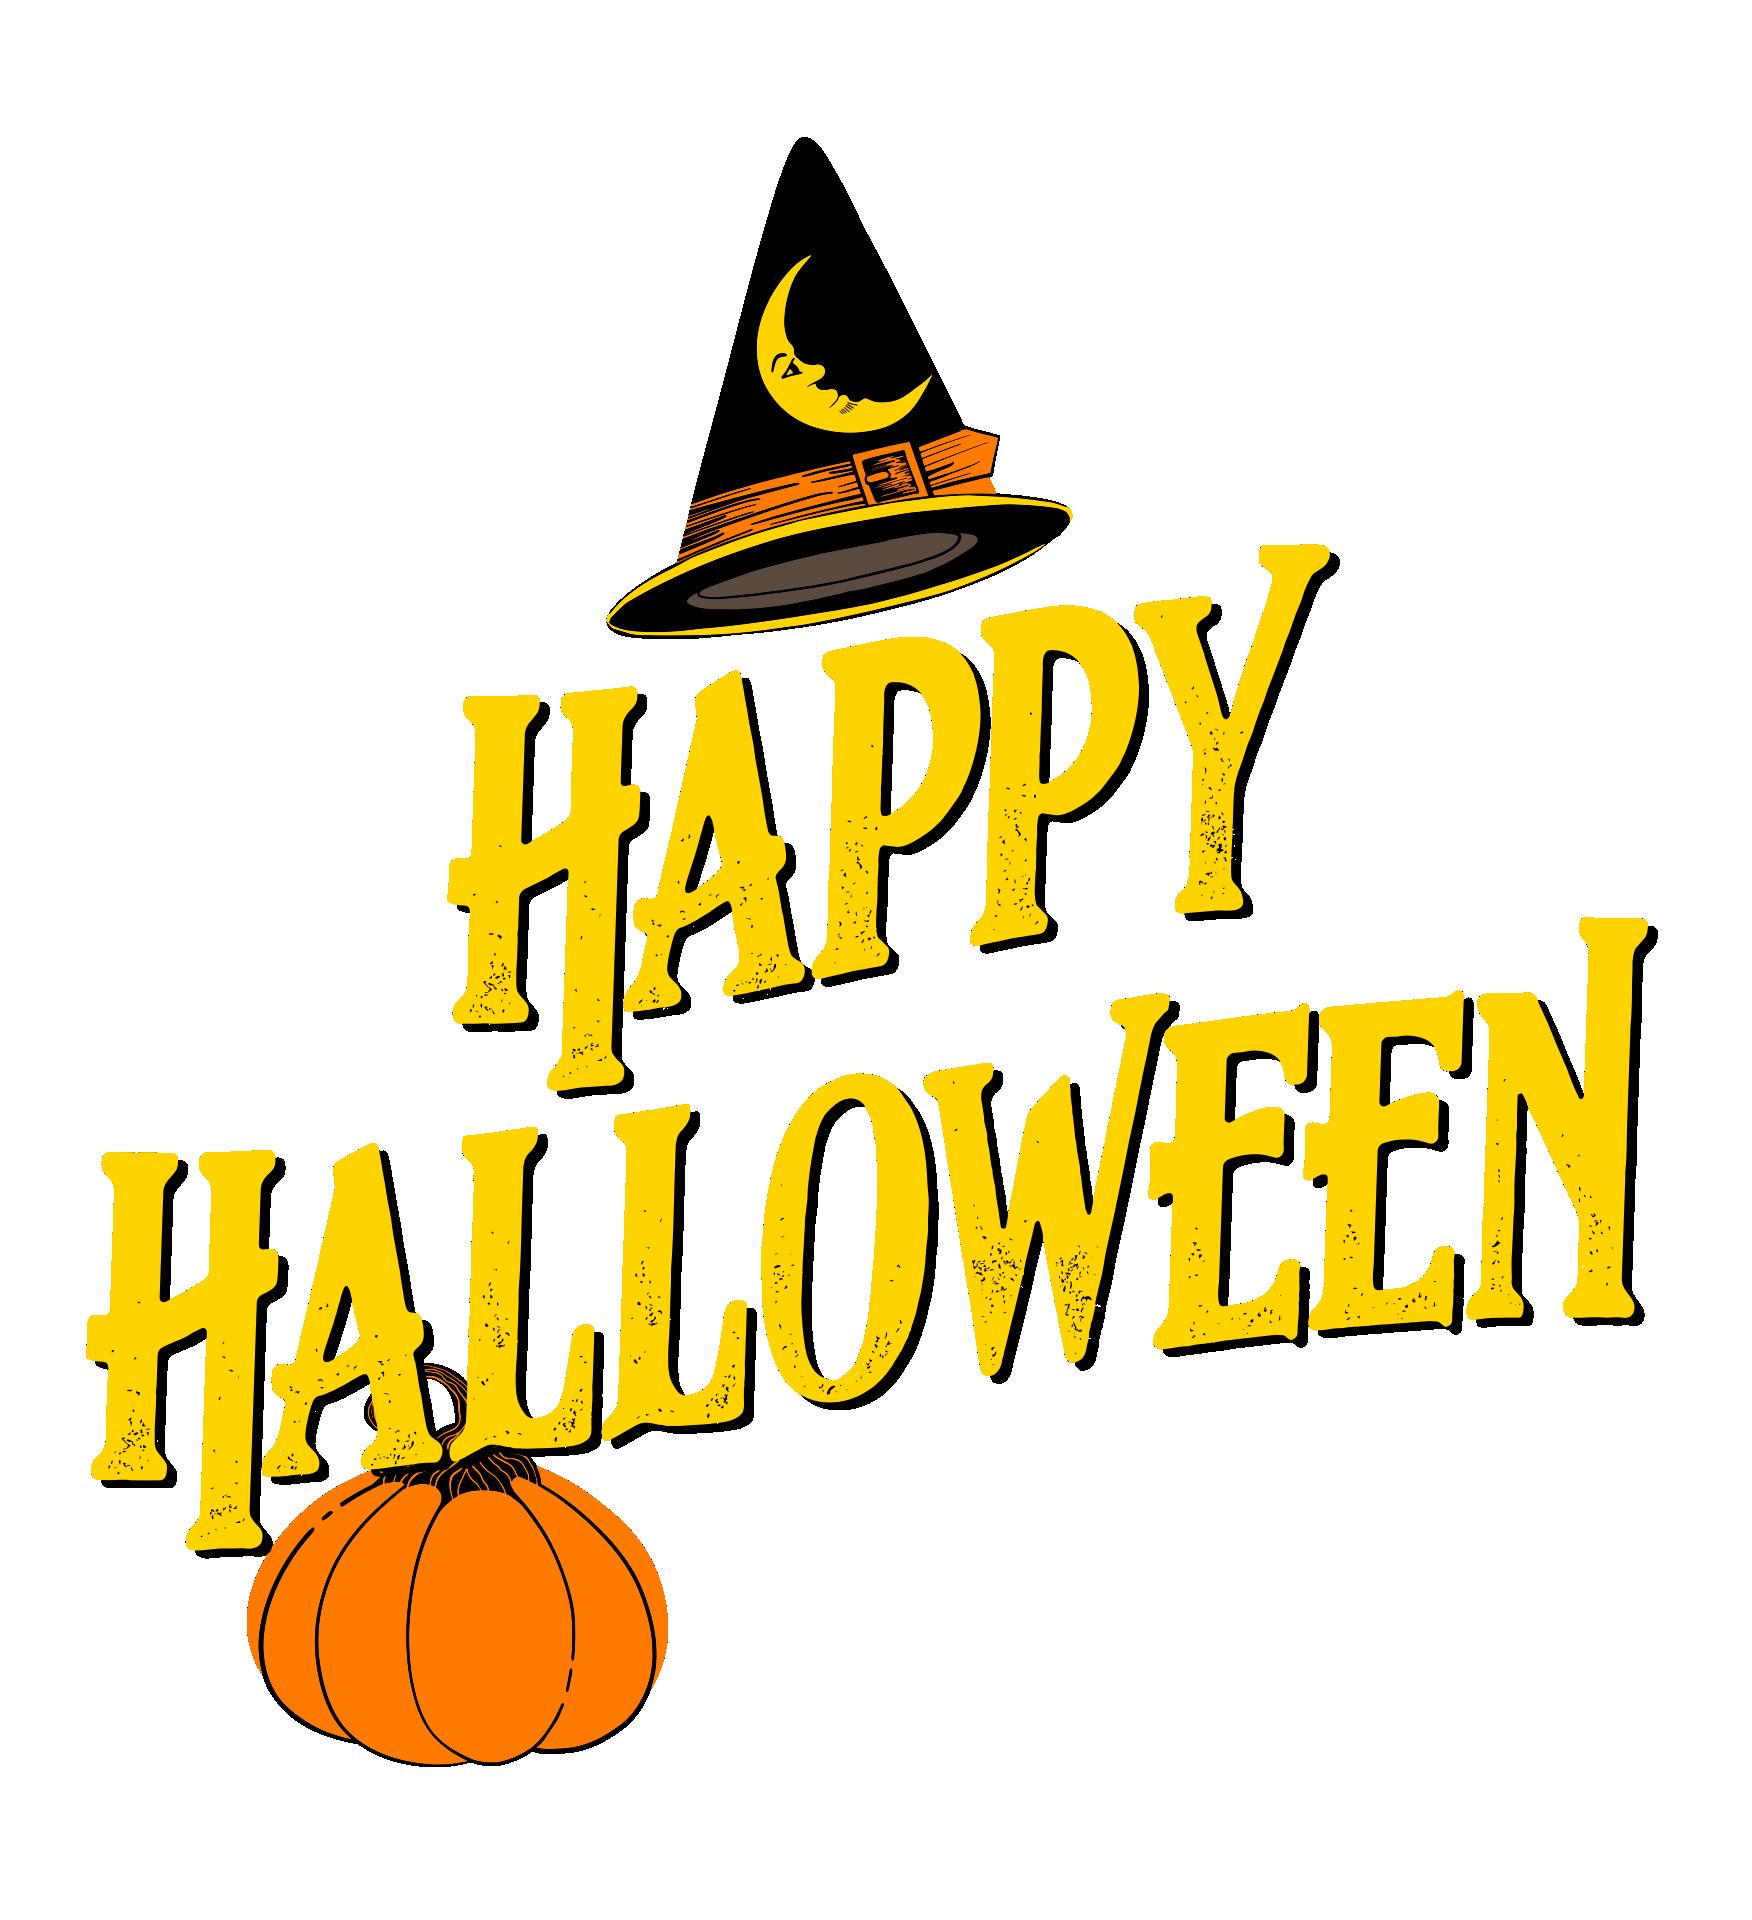 Happy Halloween Birthday Printable Card Transparent